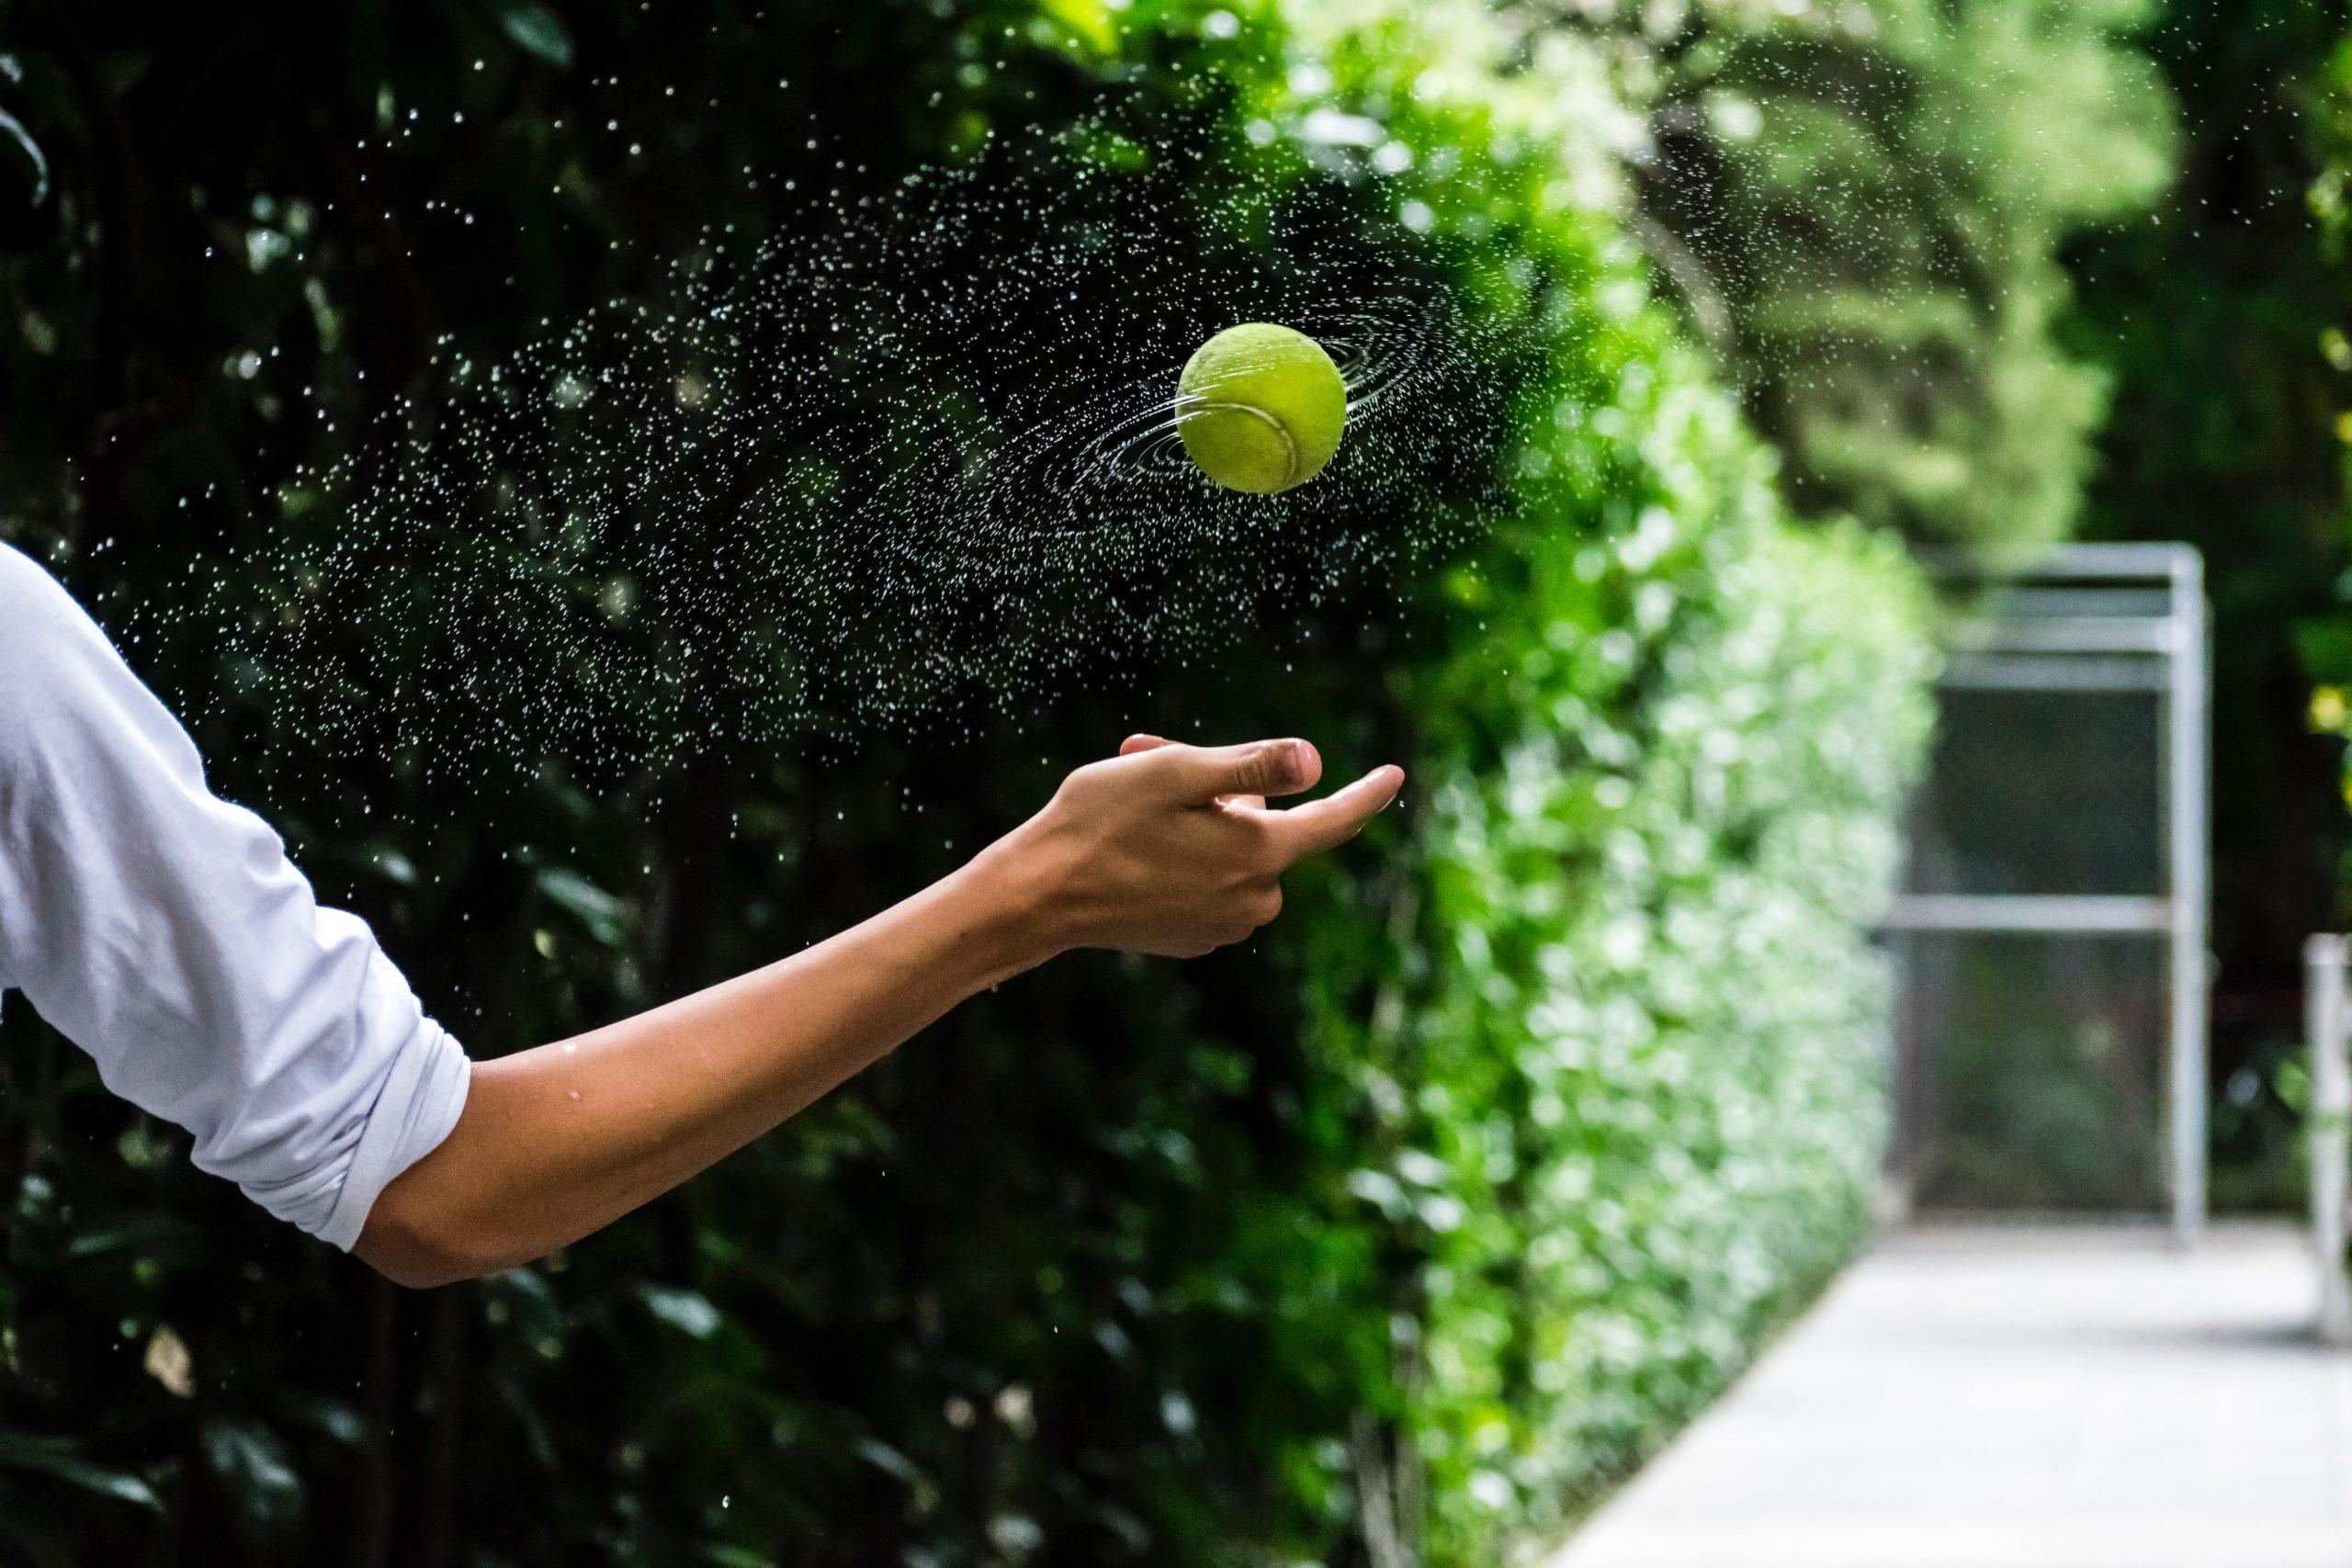 Enter Wimbledon